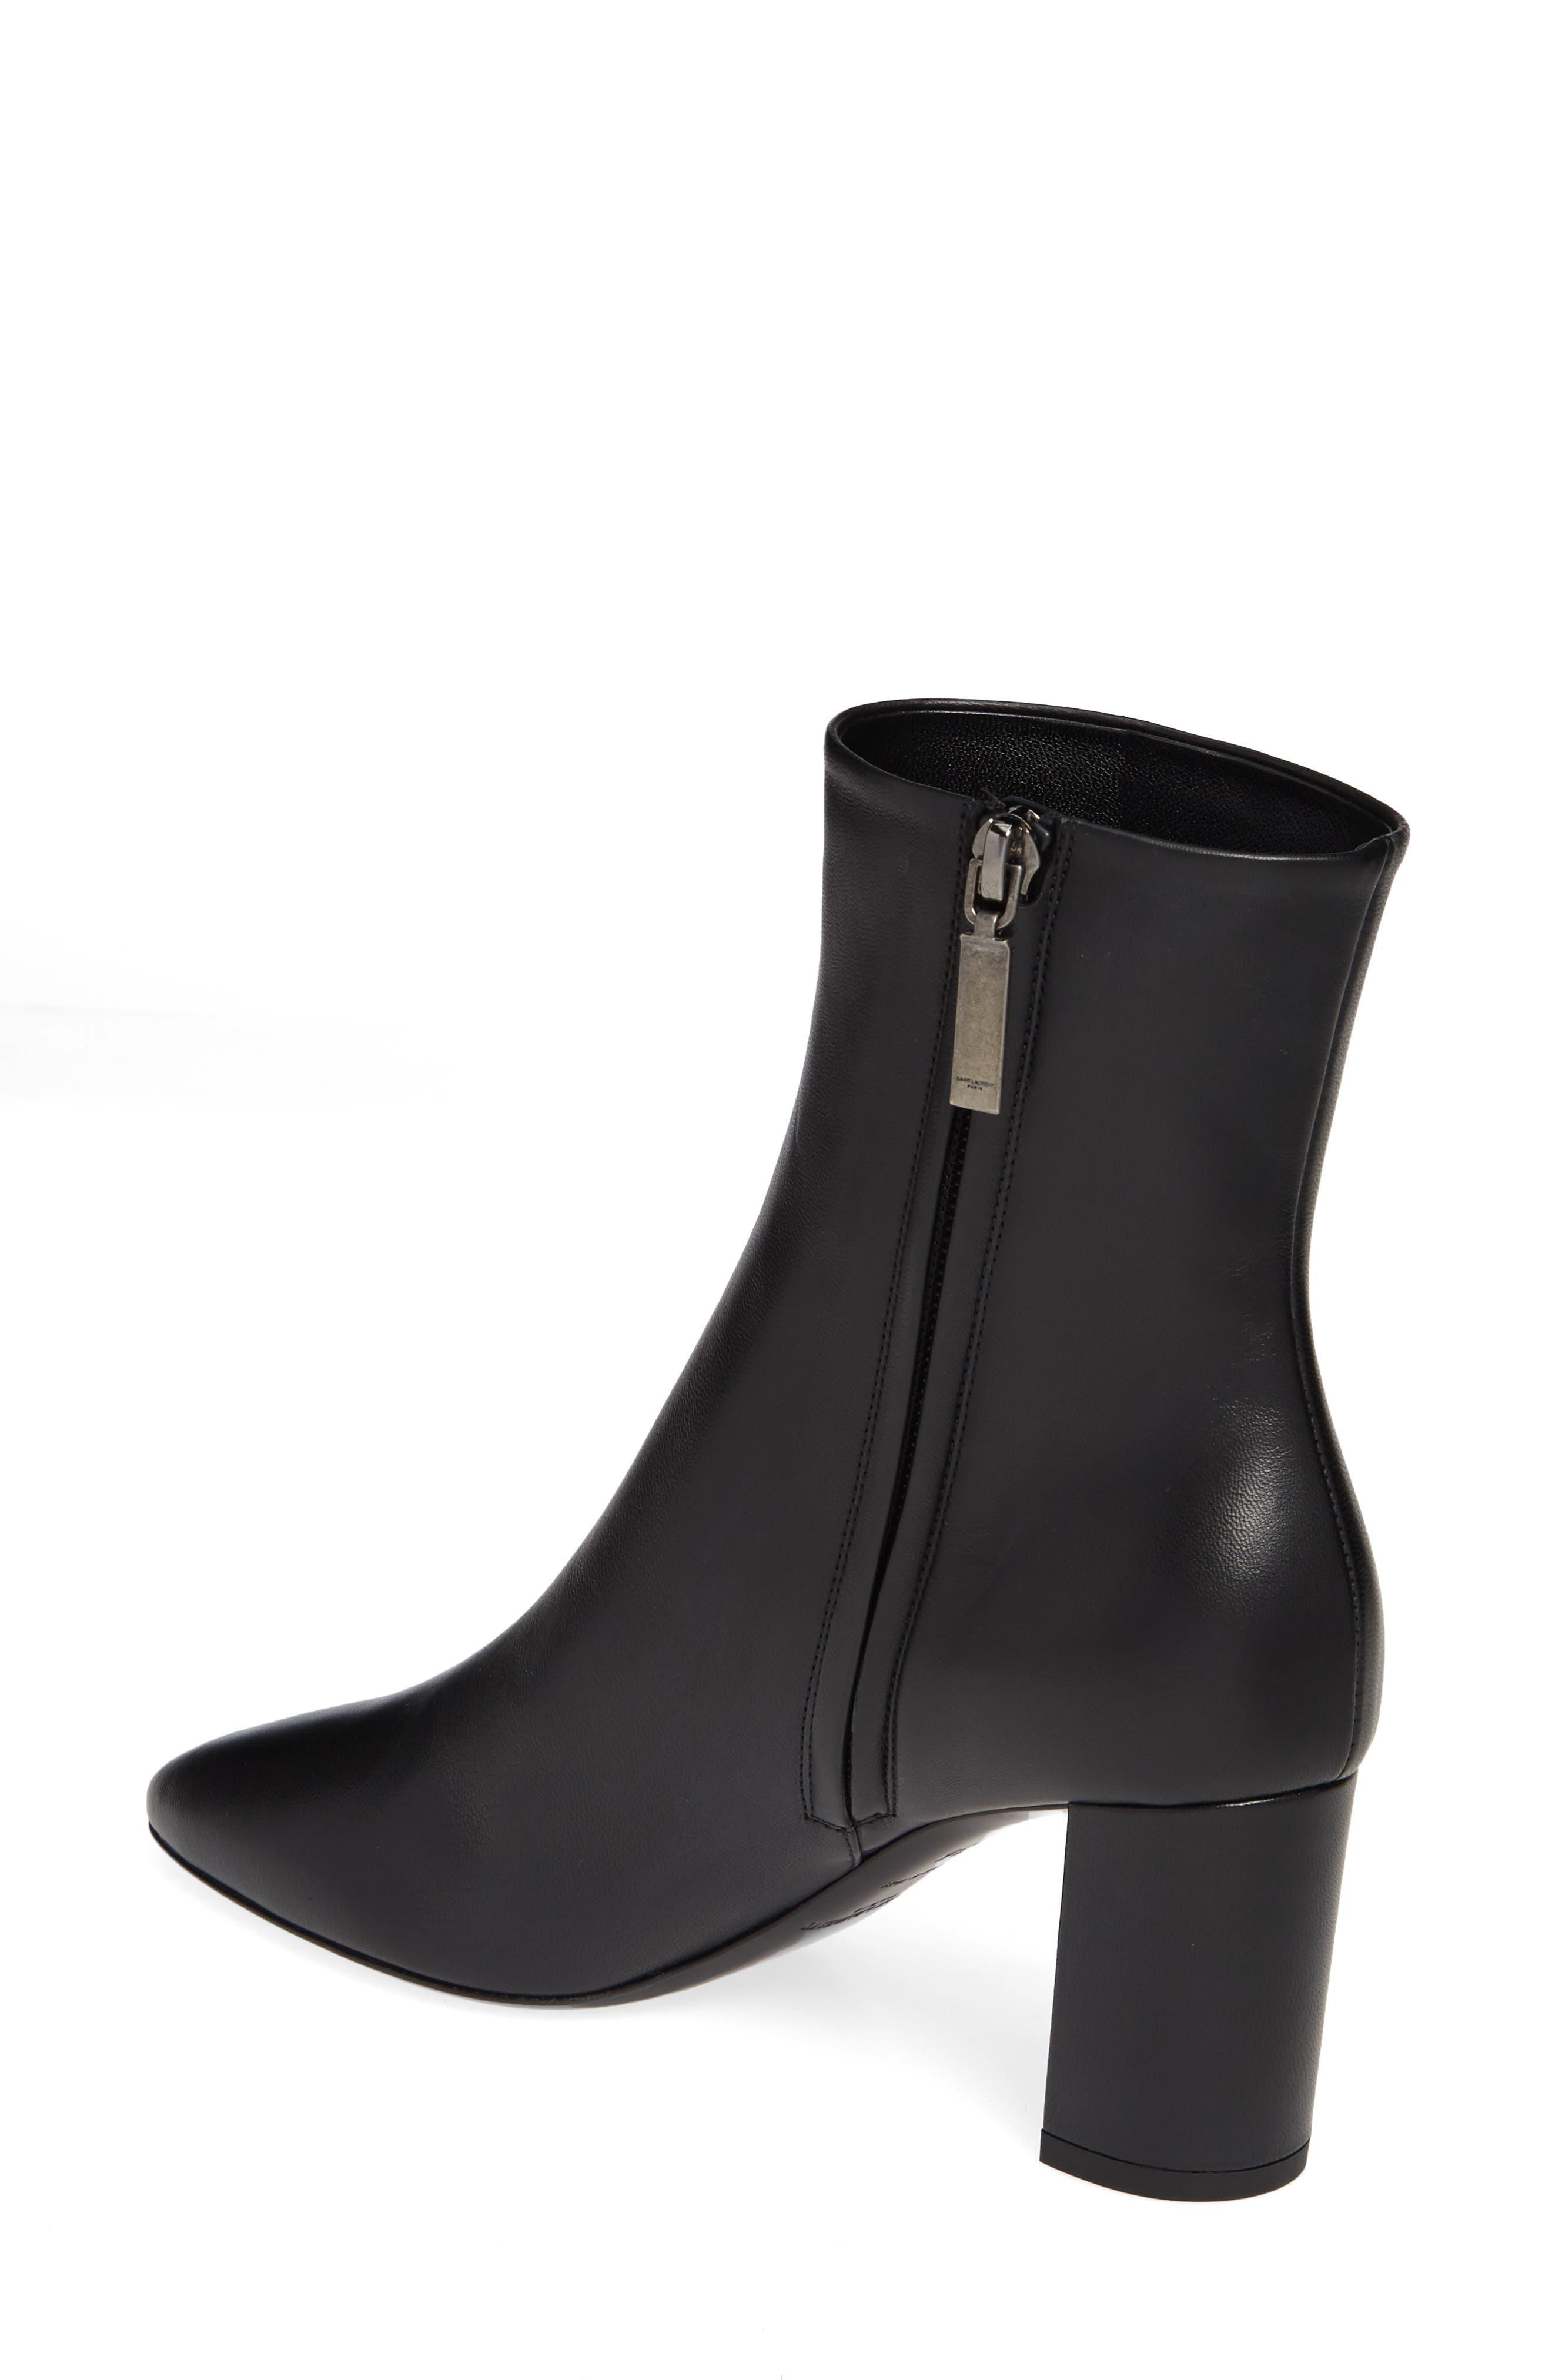 a68eefc61ac yves saint laurent boots | Nordstrom